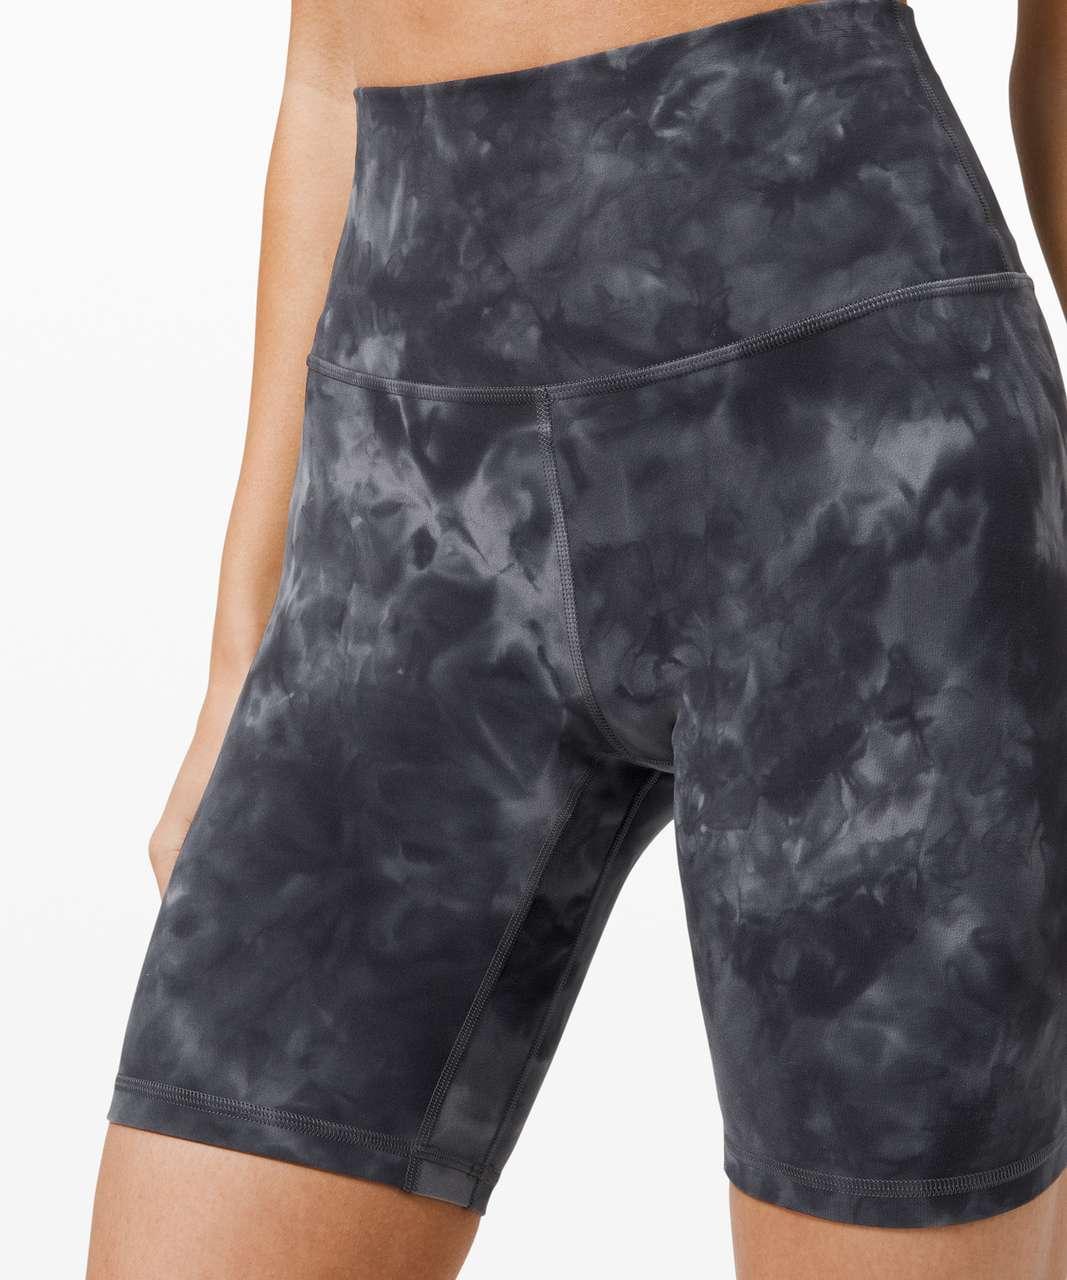 "Lululemon Align Short 8"" *Diamond Dye - Diamond Dye Pitch Grey Graphite Grey"